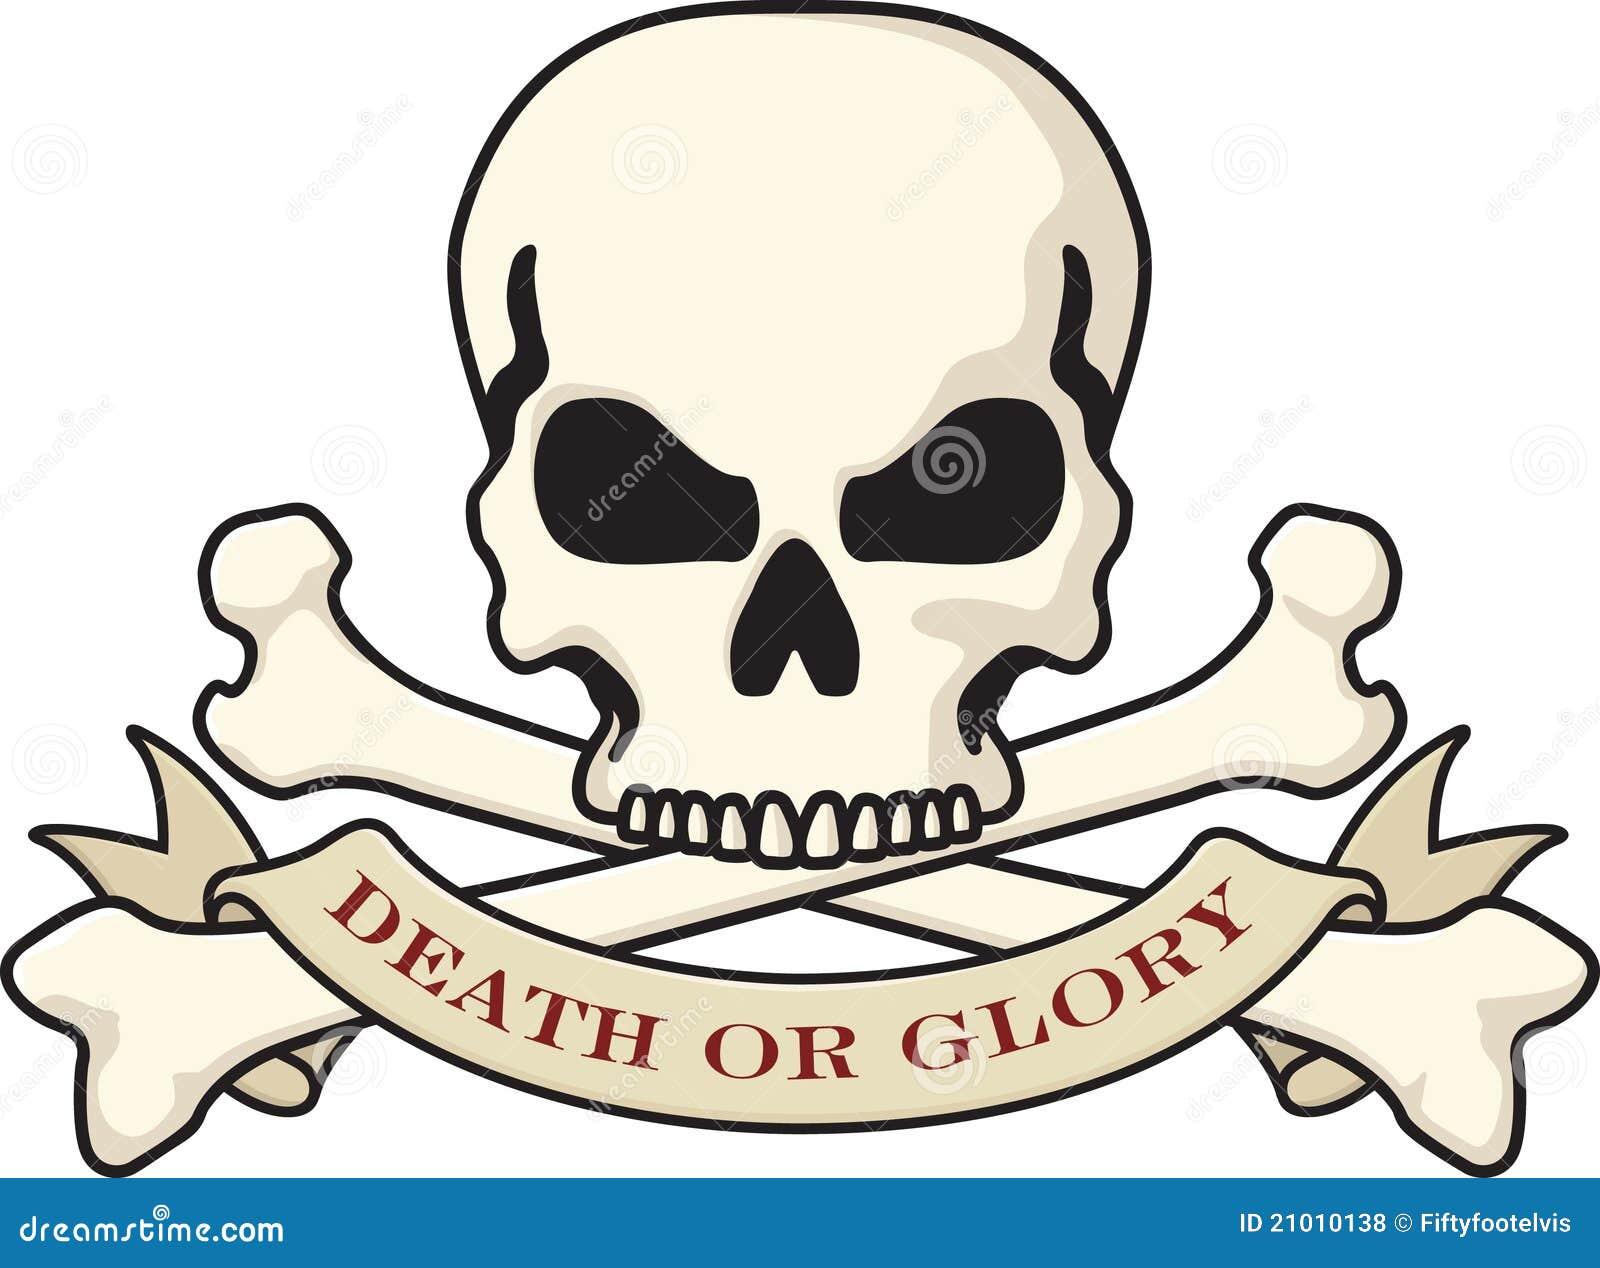 Skull And Crossbones Stock Vector Illustration Of Glory 21010138